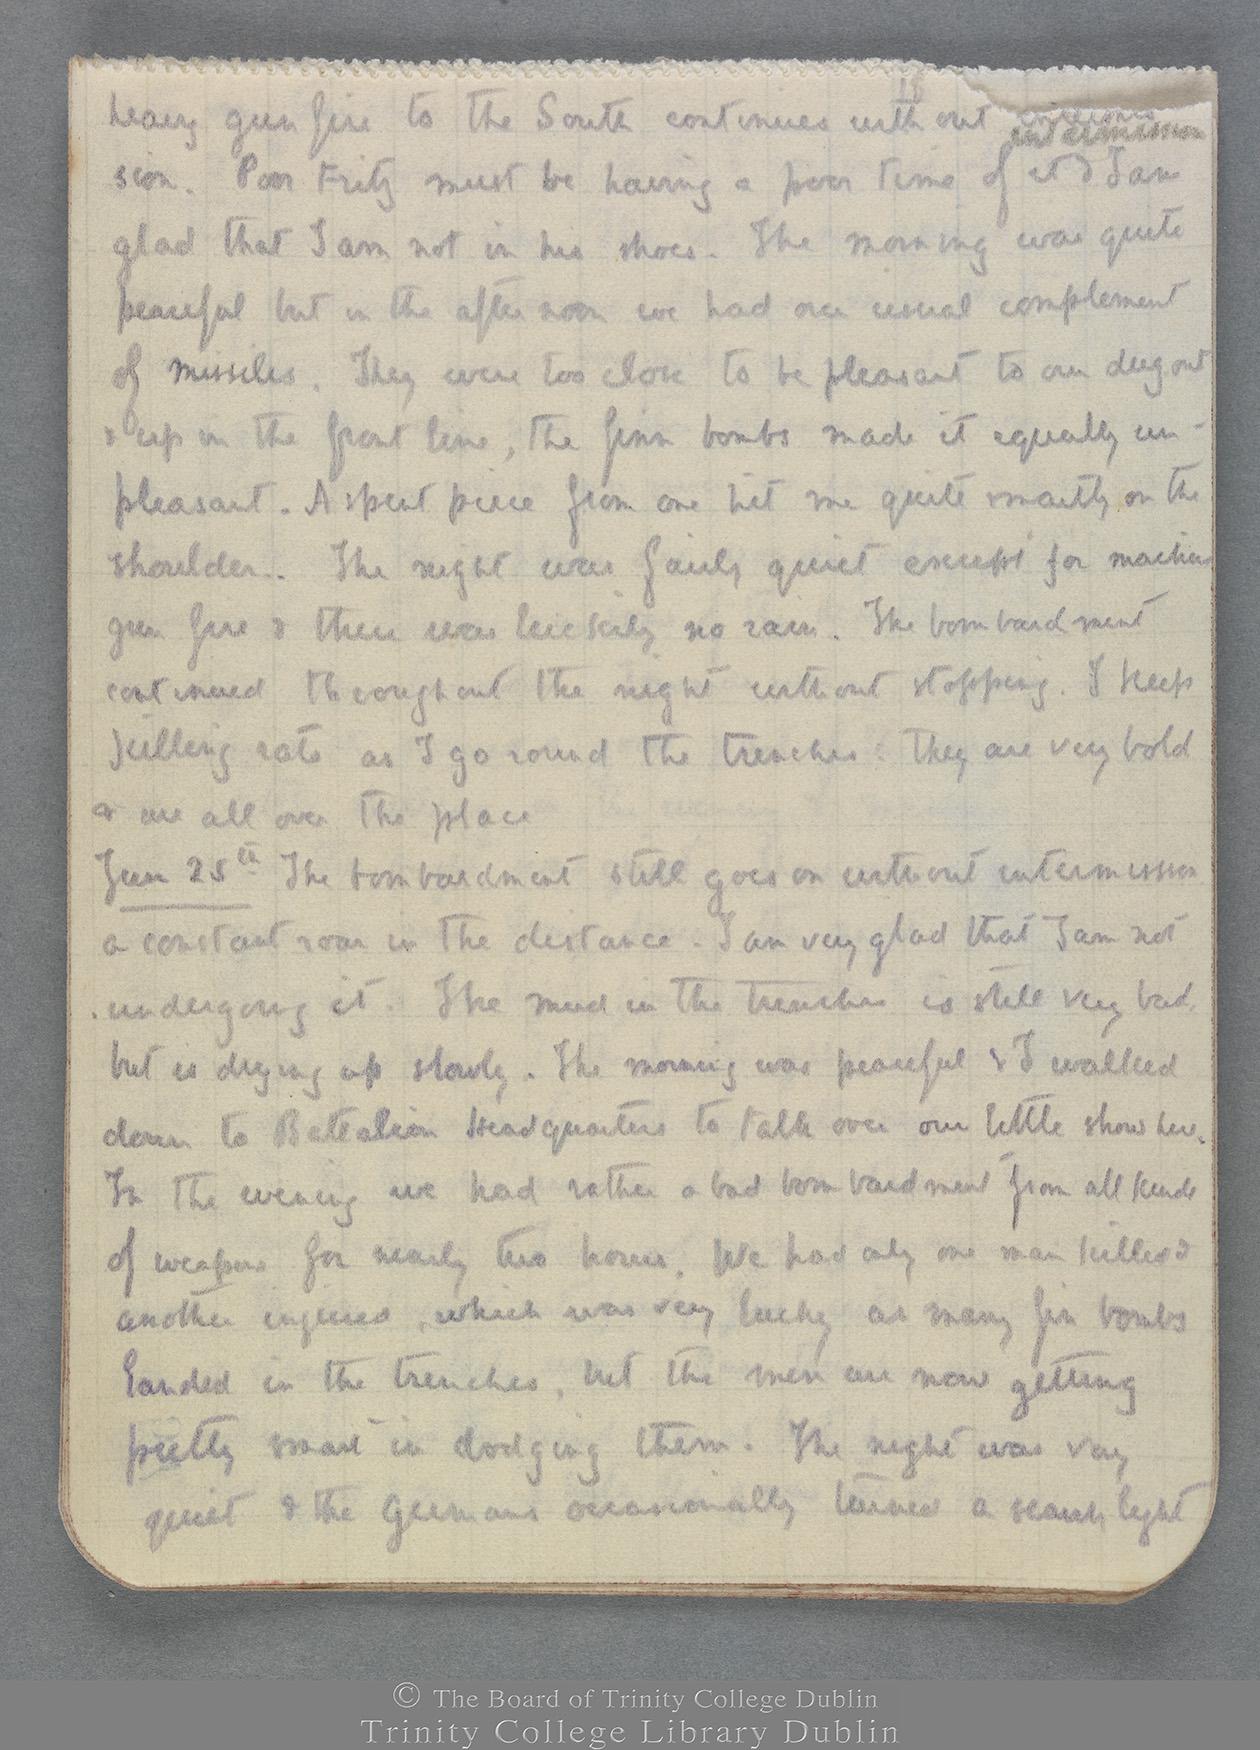 TCD MS 10821 folio 18 recto